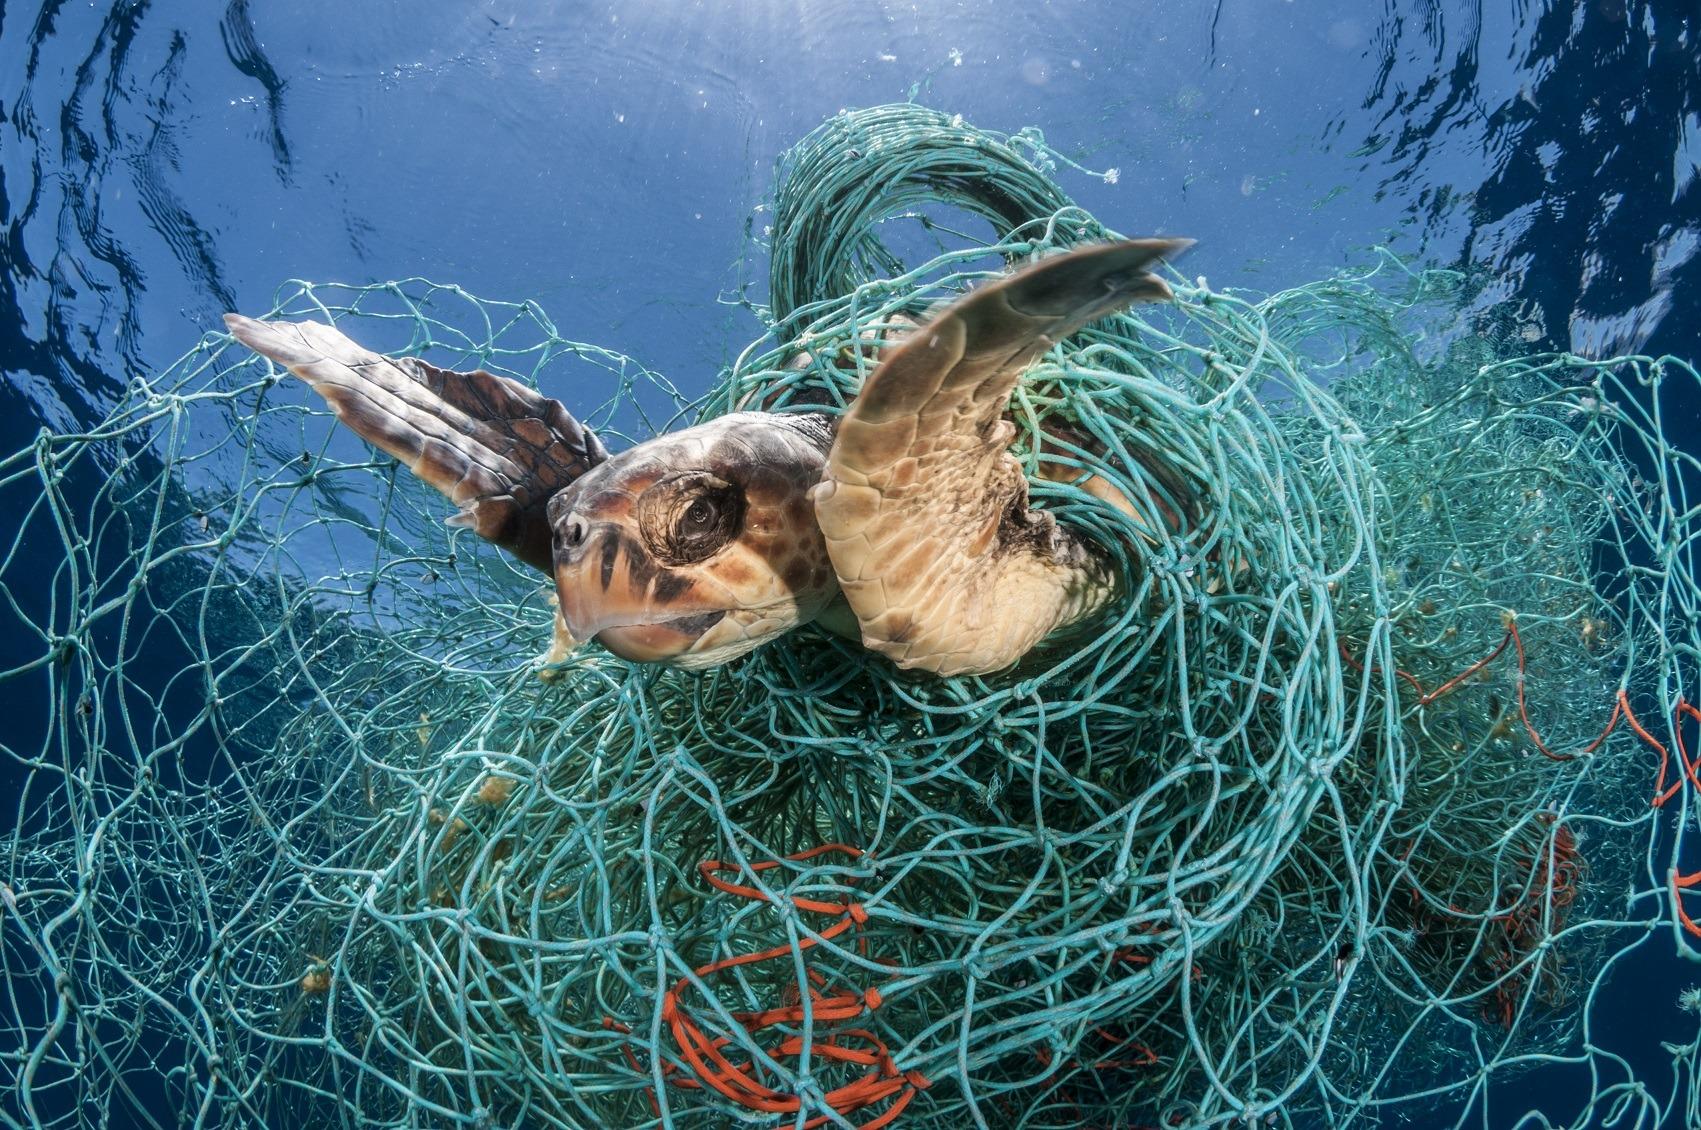 Loggerhead turtle (Caretta caretta) trapped in an abandoned drifting net, Balearic Channel, Mediterranean sea.